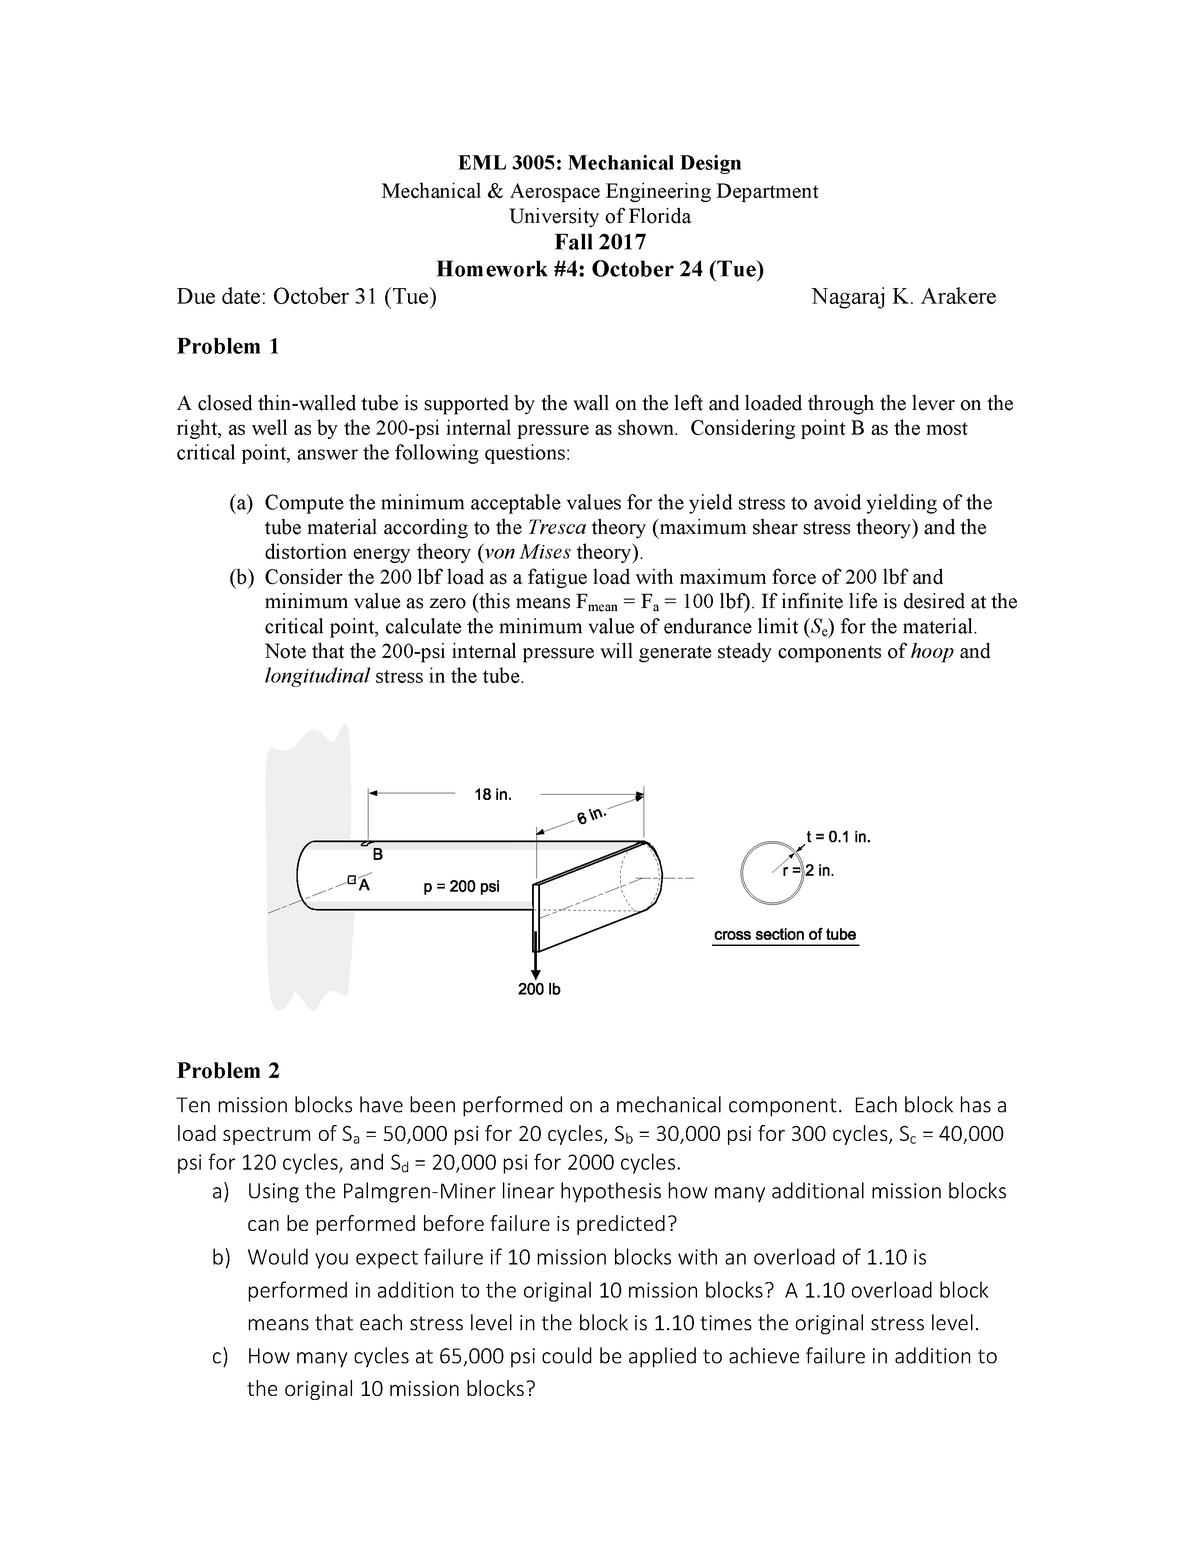 Homework # 4 - EML 3005: Mechanical Design - StuDocu